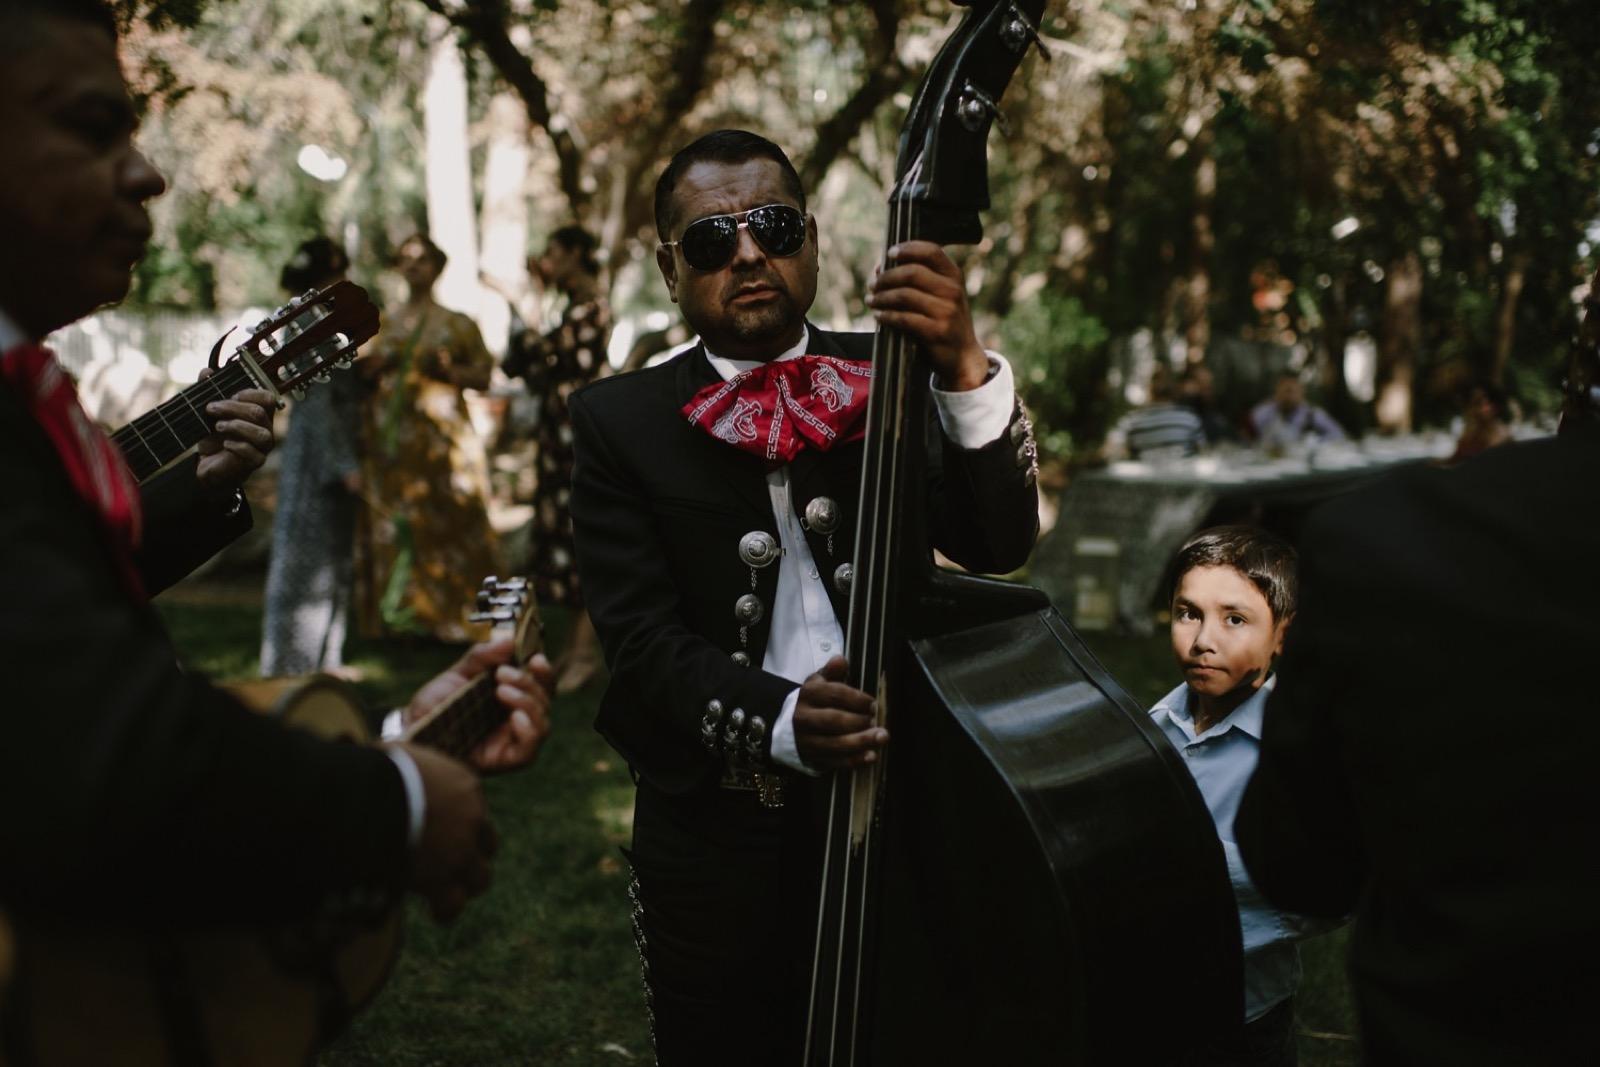 059_California_Ranch_Wedding162.jpg